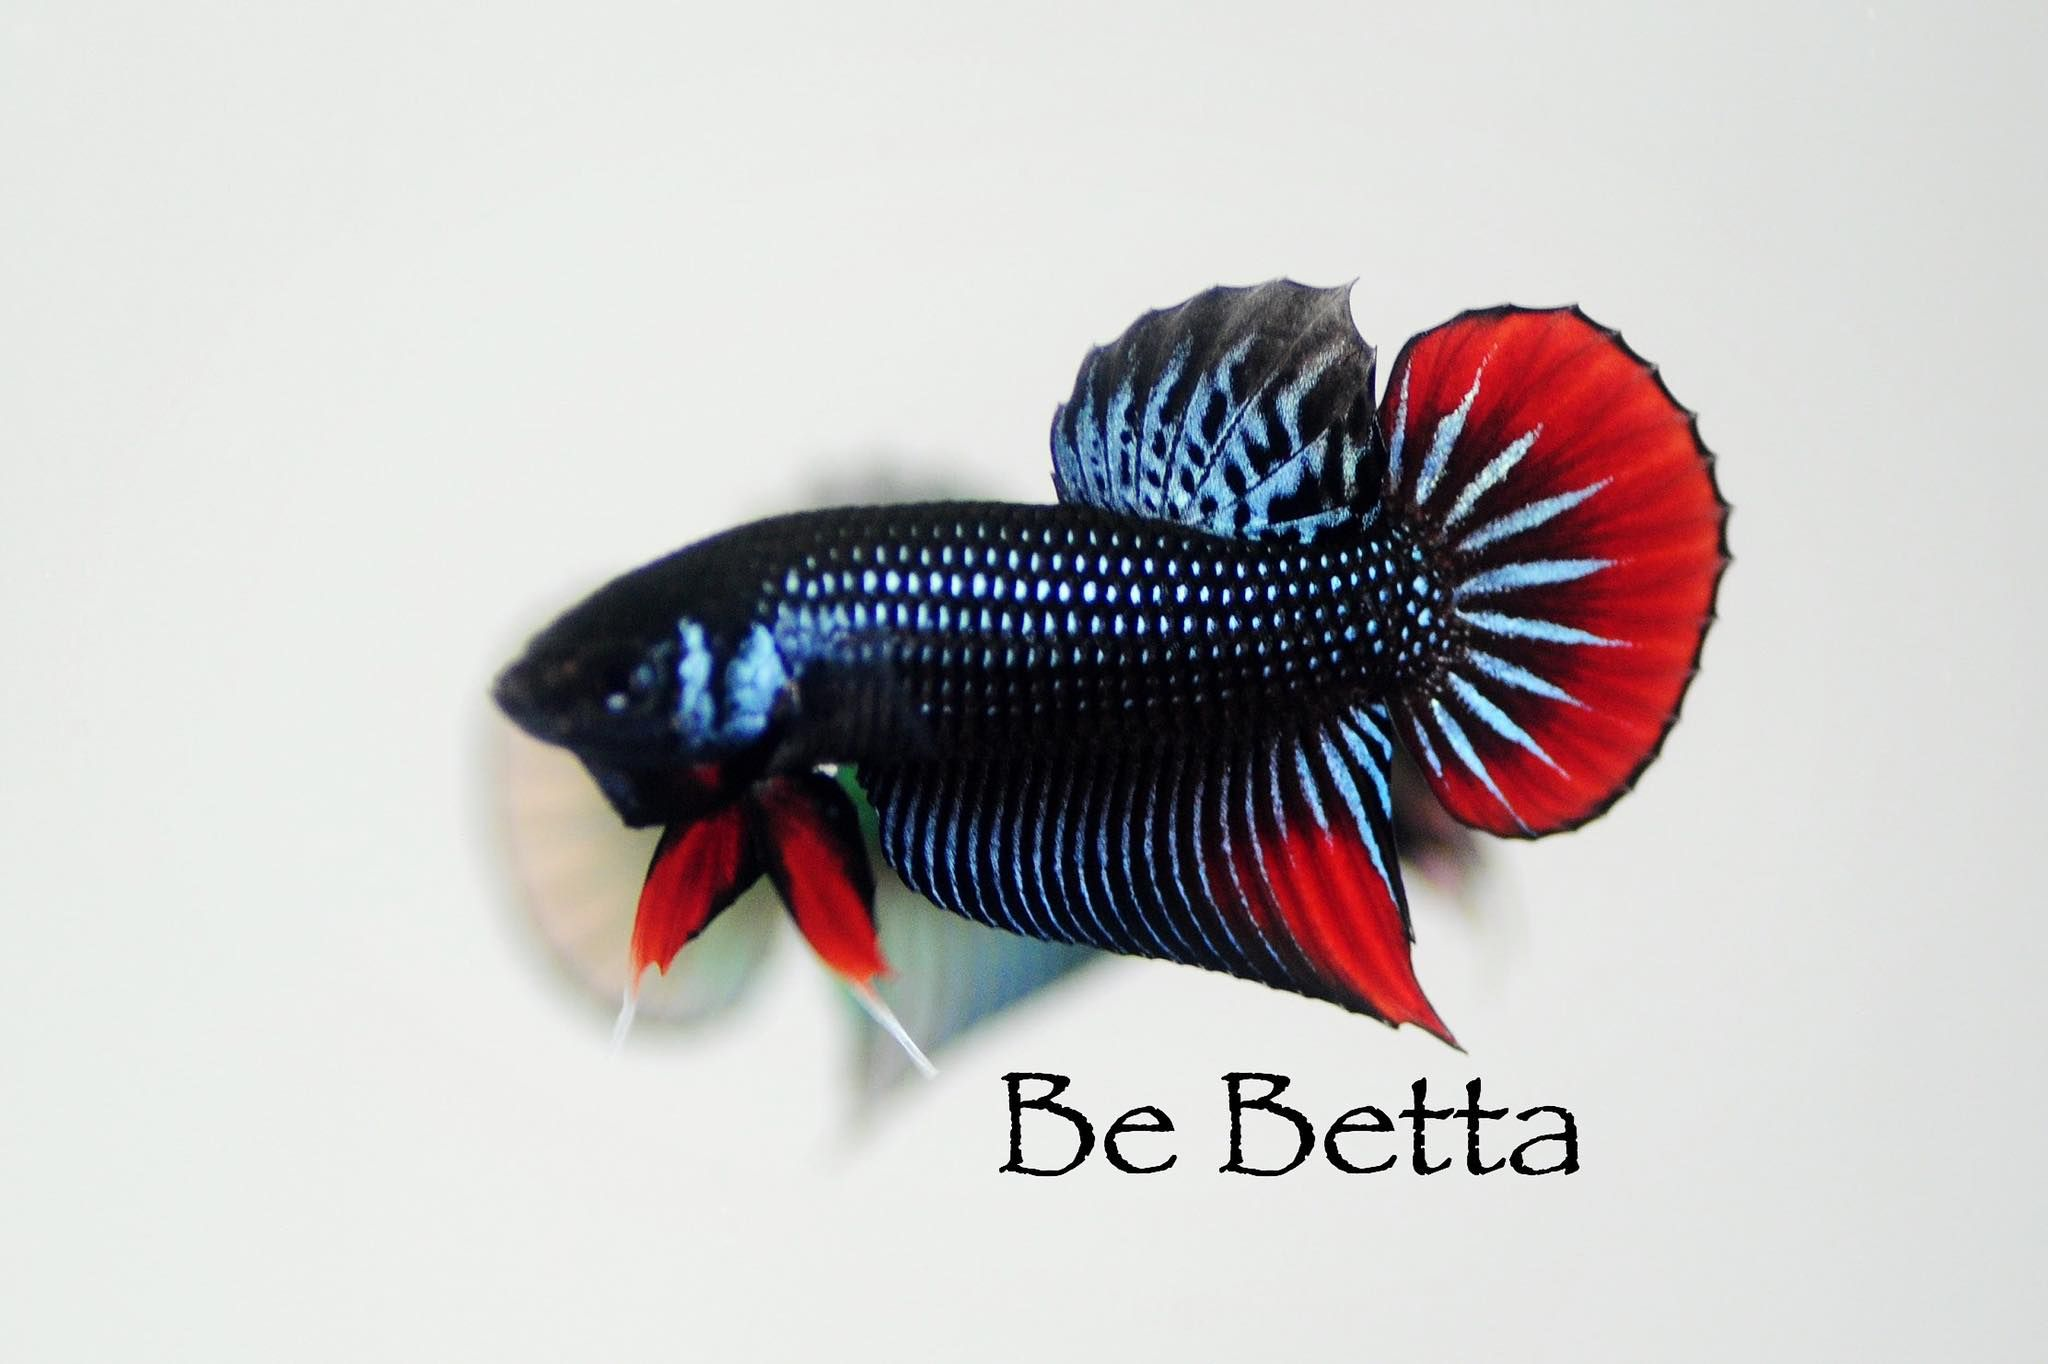 #bebetta #bettafish #betta #wildbetta #ปลากัด #ปลากัดป่า #ปลากัดป่าเอเลี่ยน #ปลากัดป่าพัฒนา #ปลากัดสวยงาม